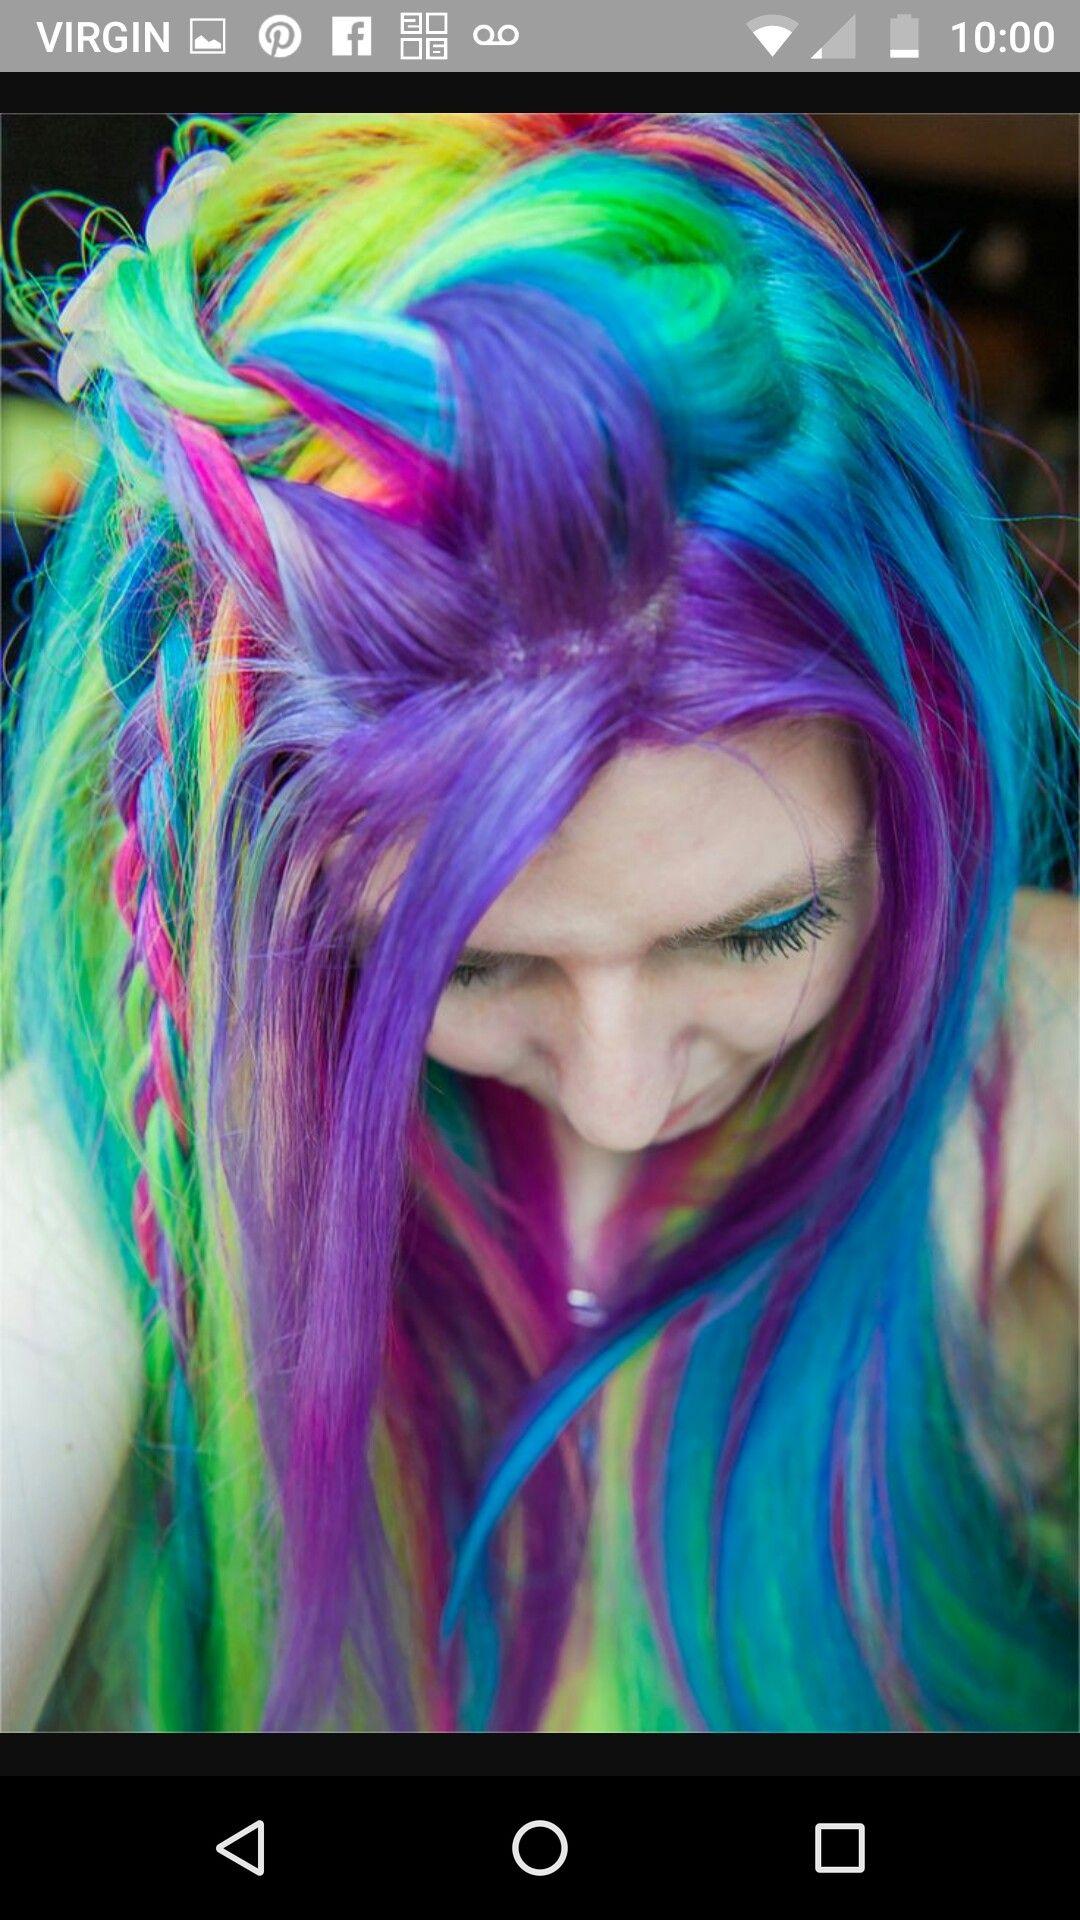 Pin by Sarah on Hair (multicolor & braids) Hair styles